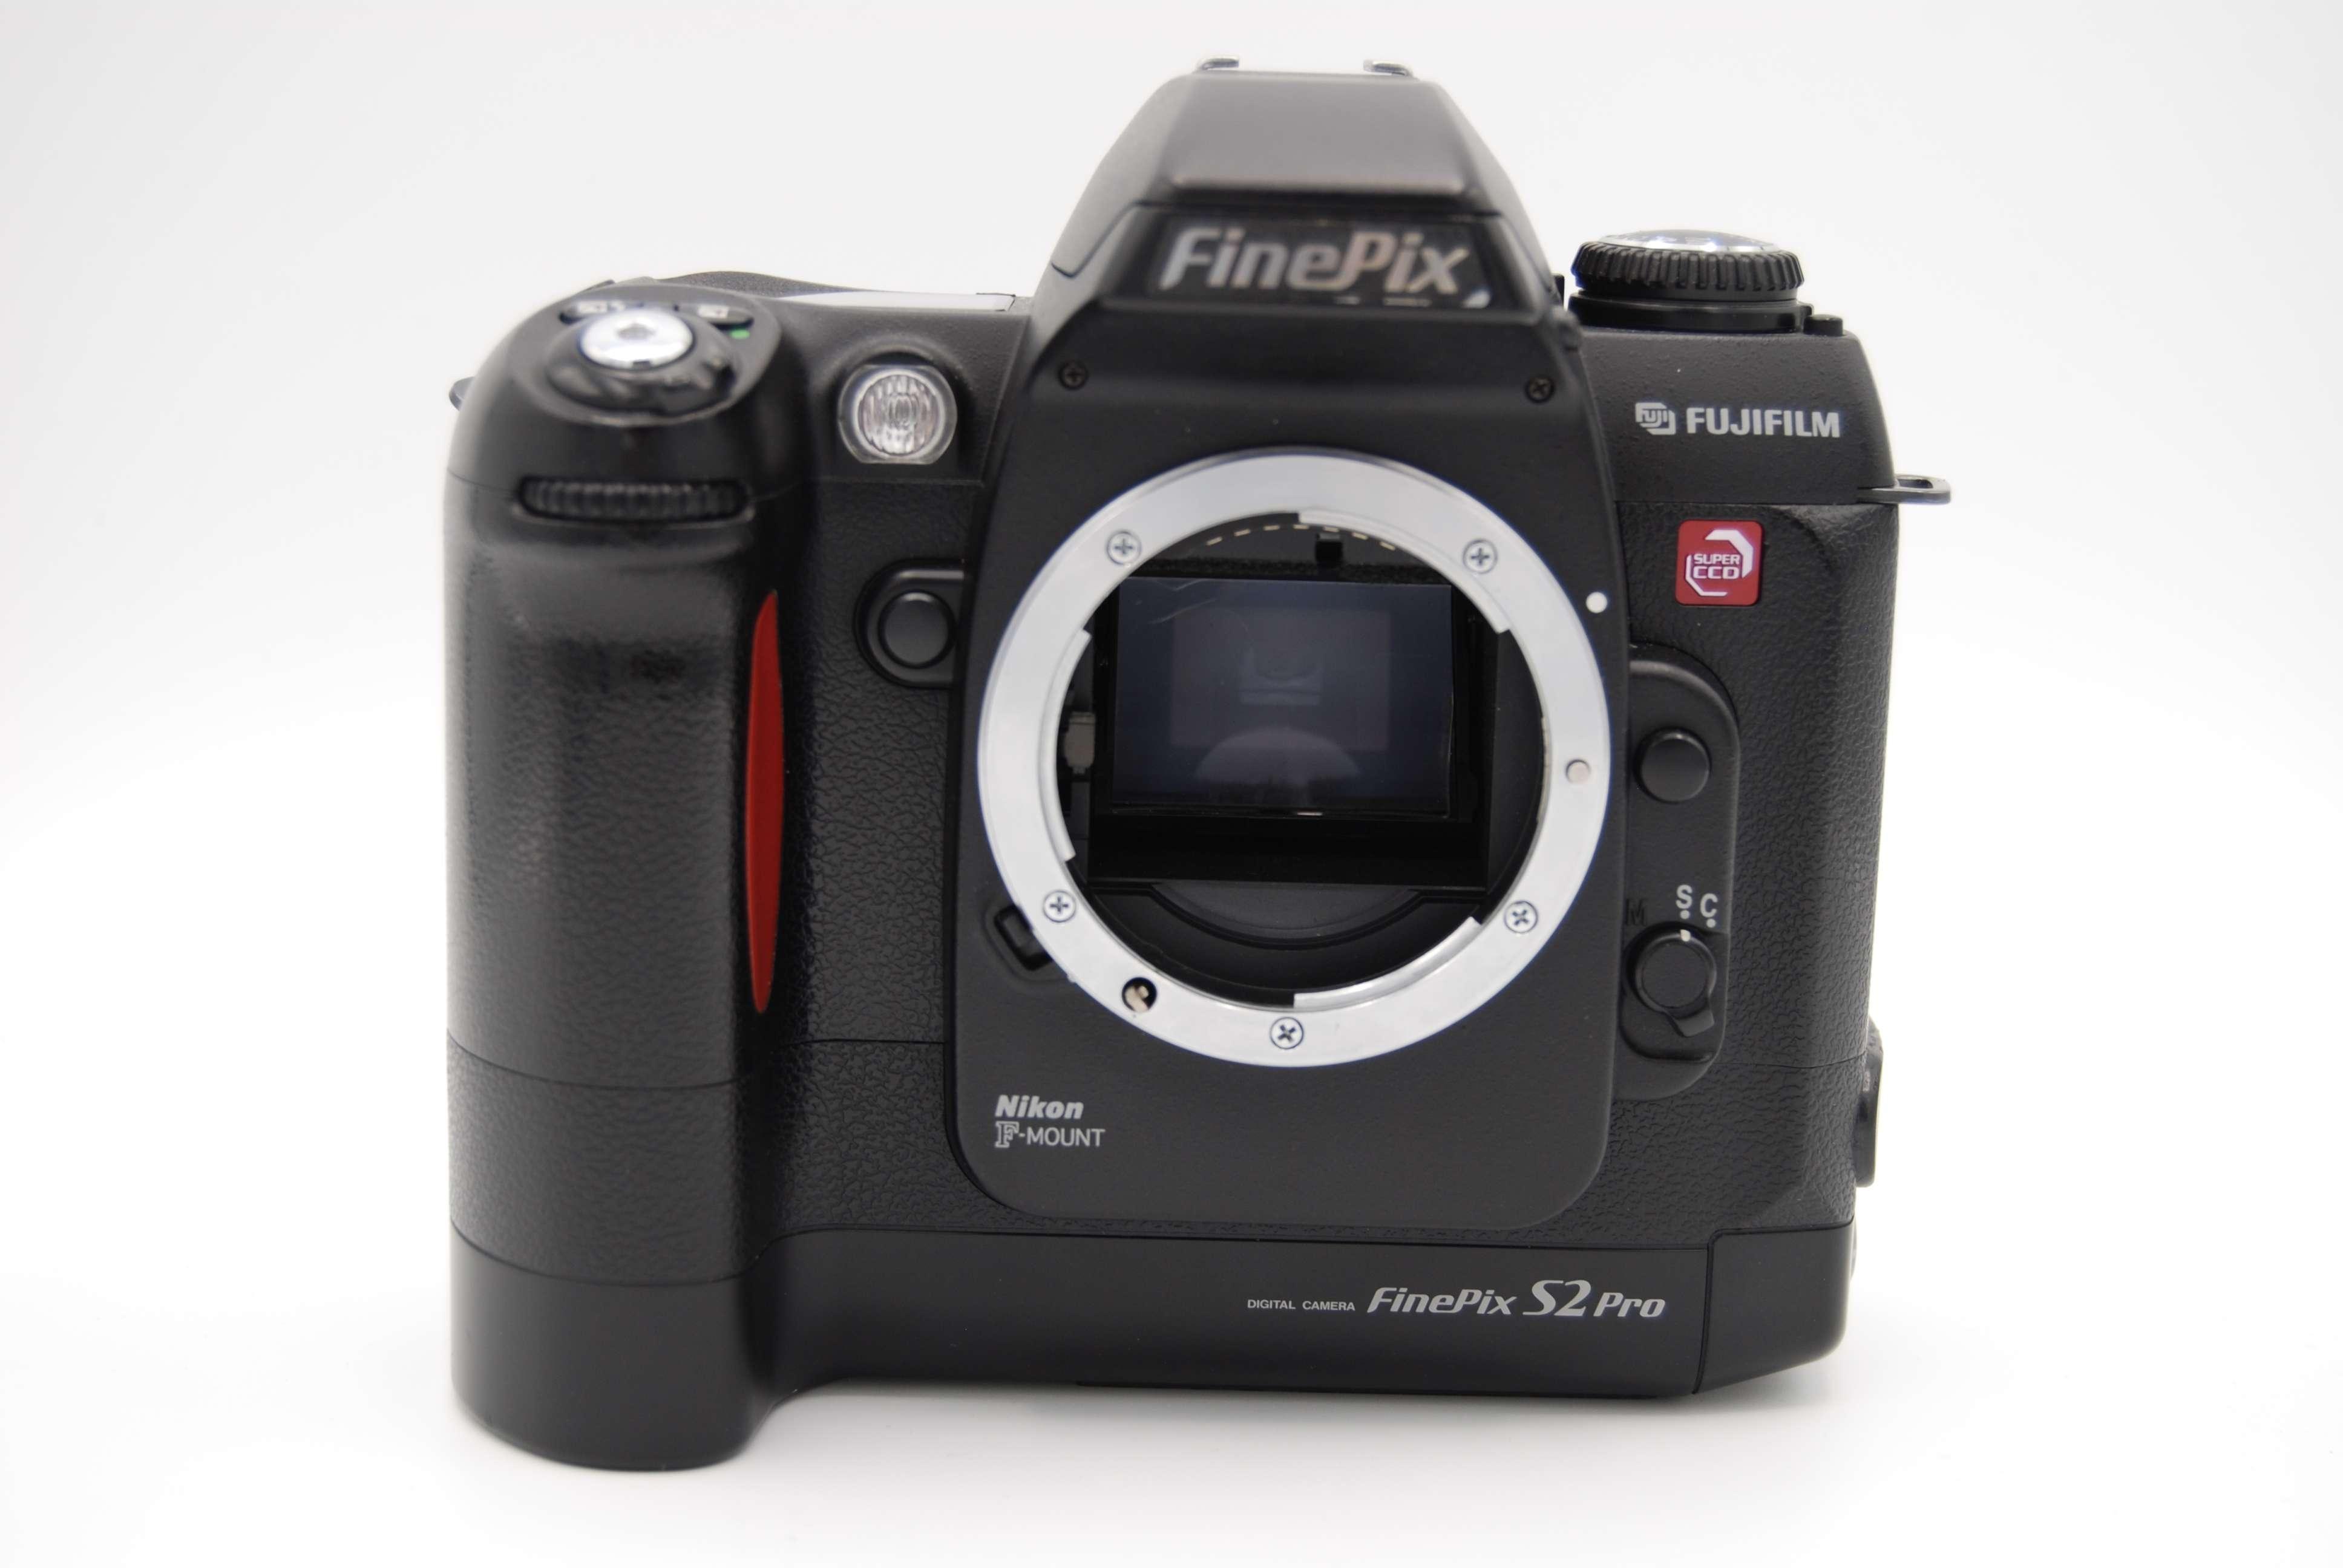 fujifilm finepix s series s2 pro 6 2 mp 1 8 screen digital camera rh ebay com